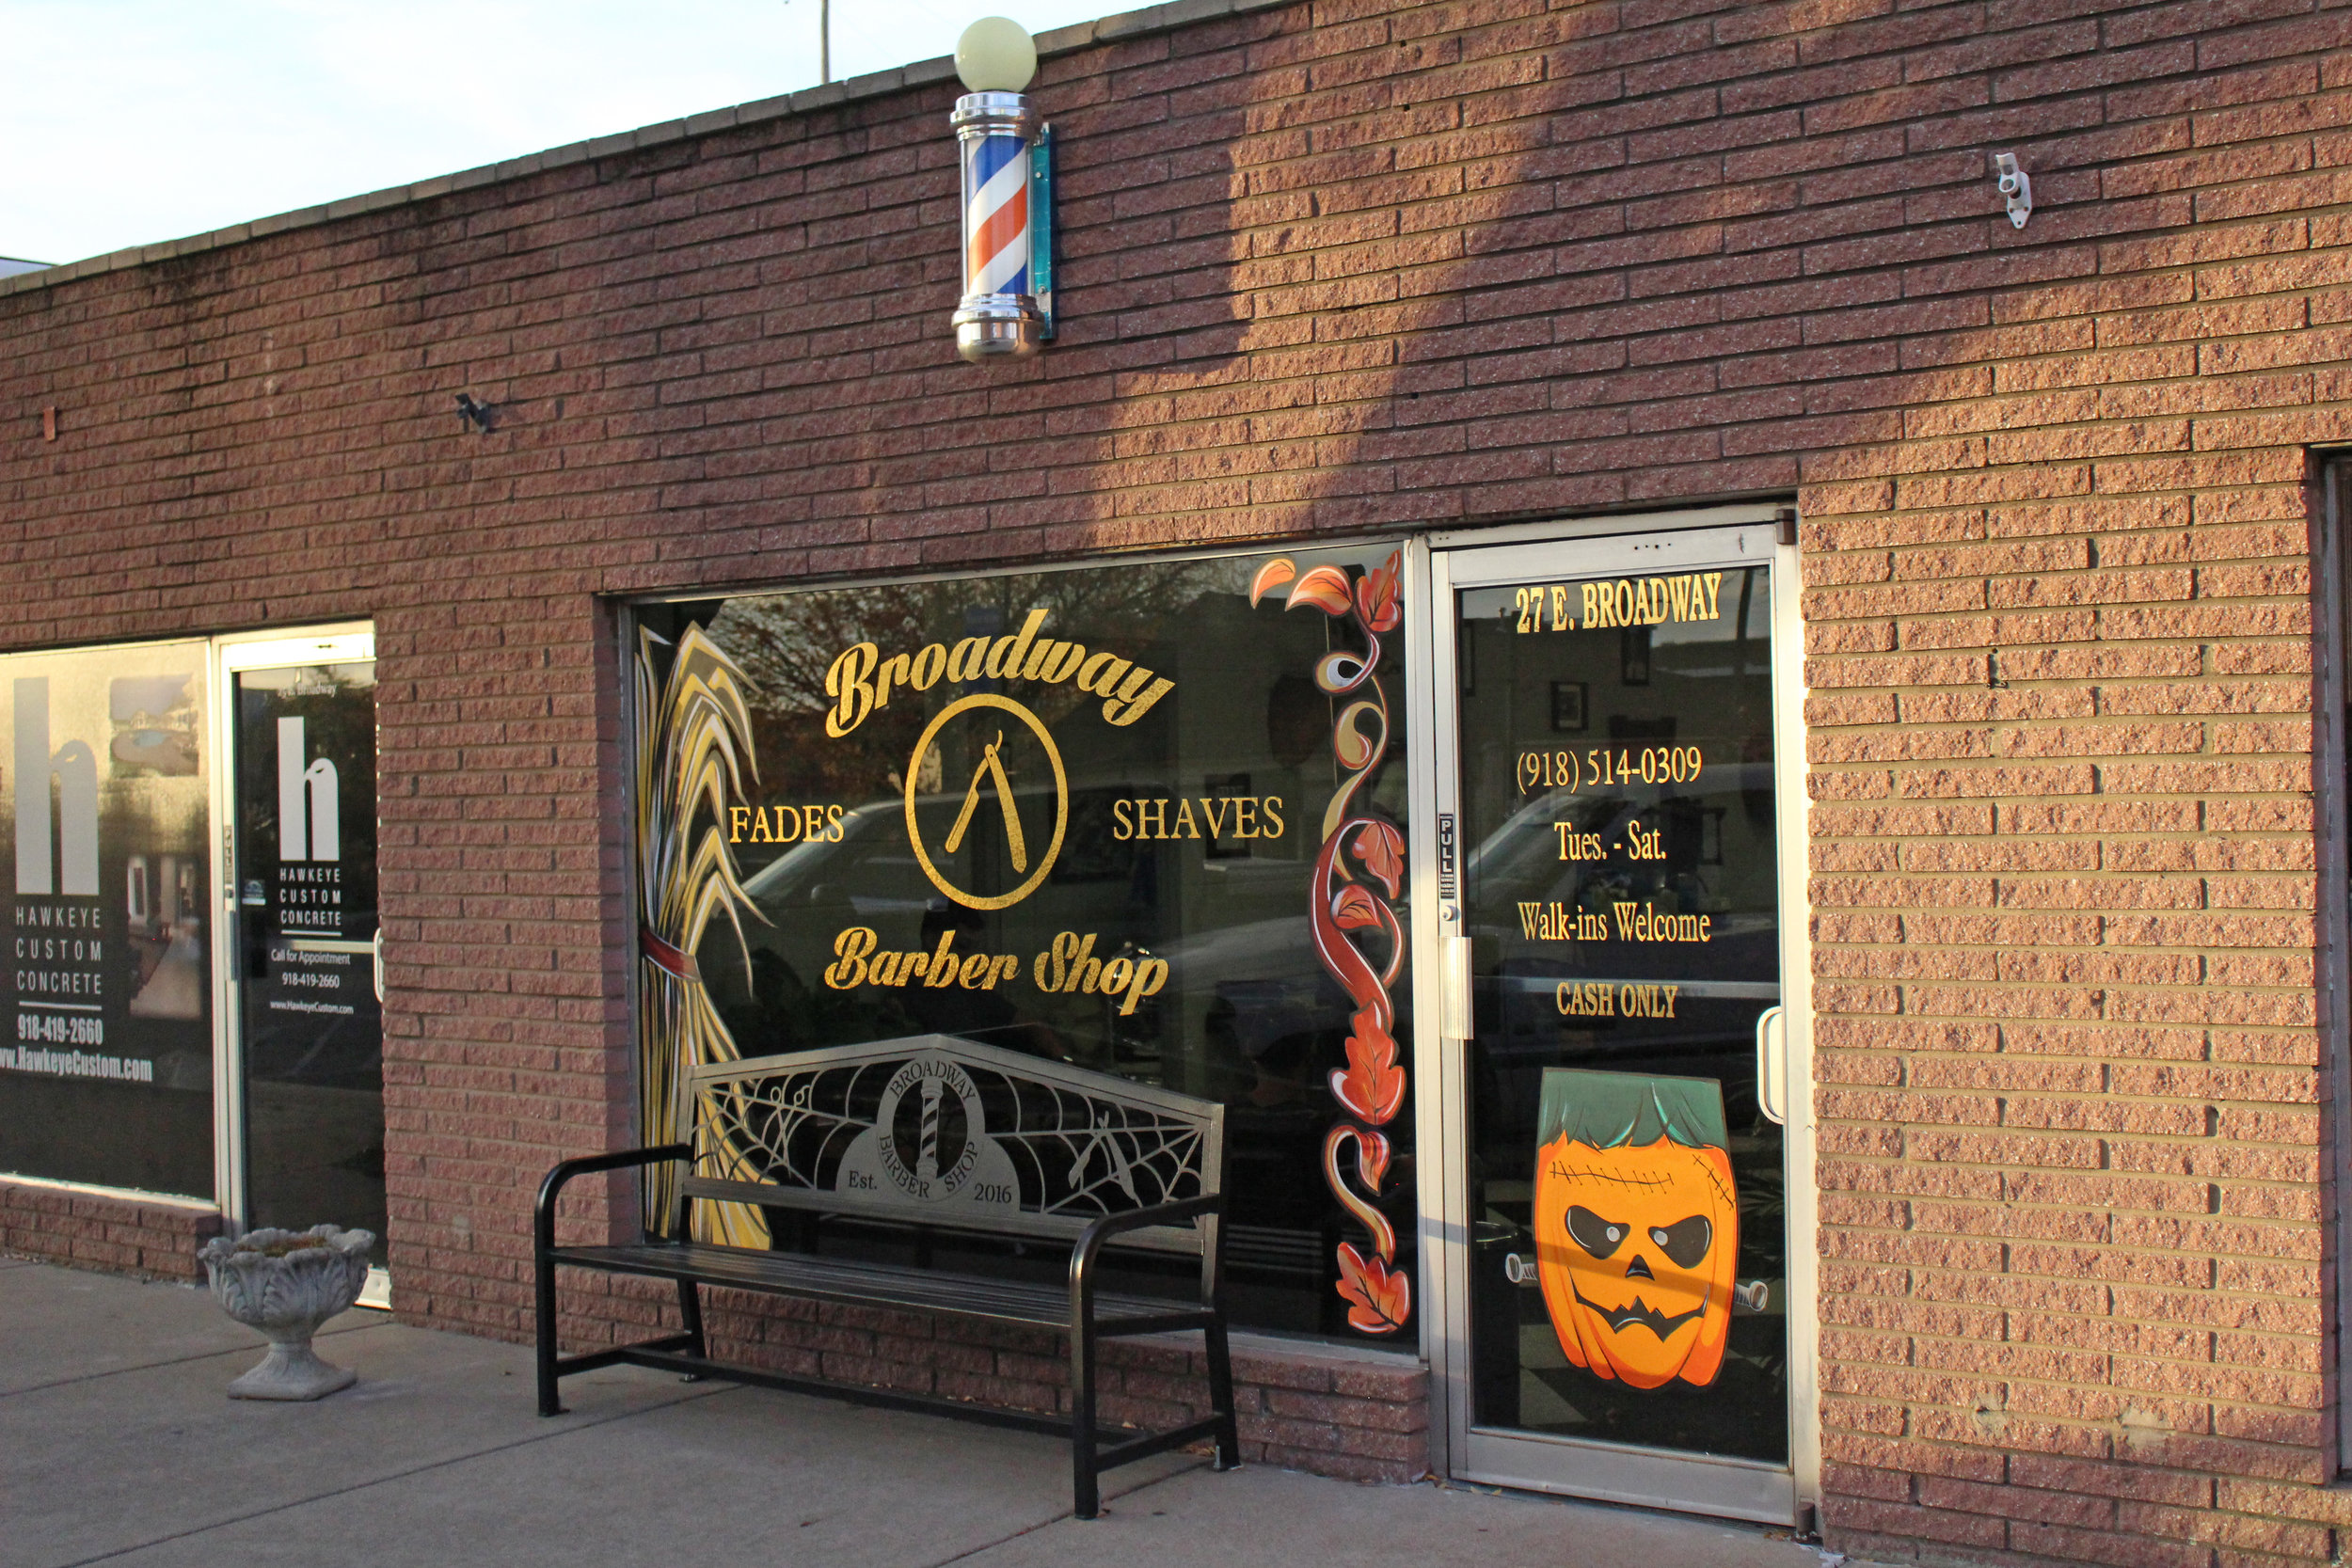 broadway barber shop - downtown 29 east broadway street